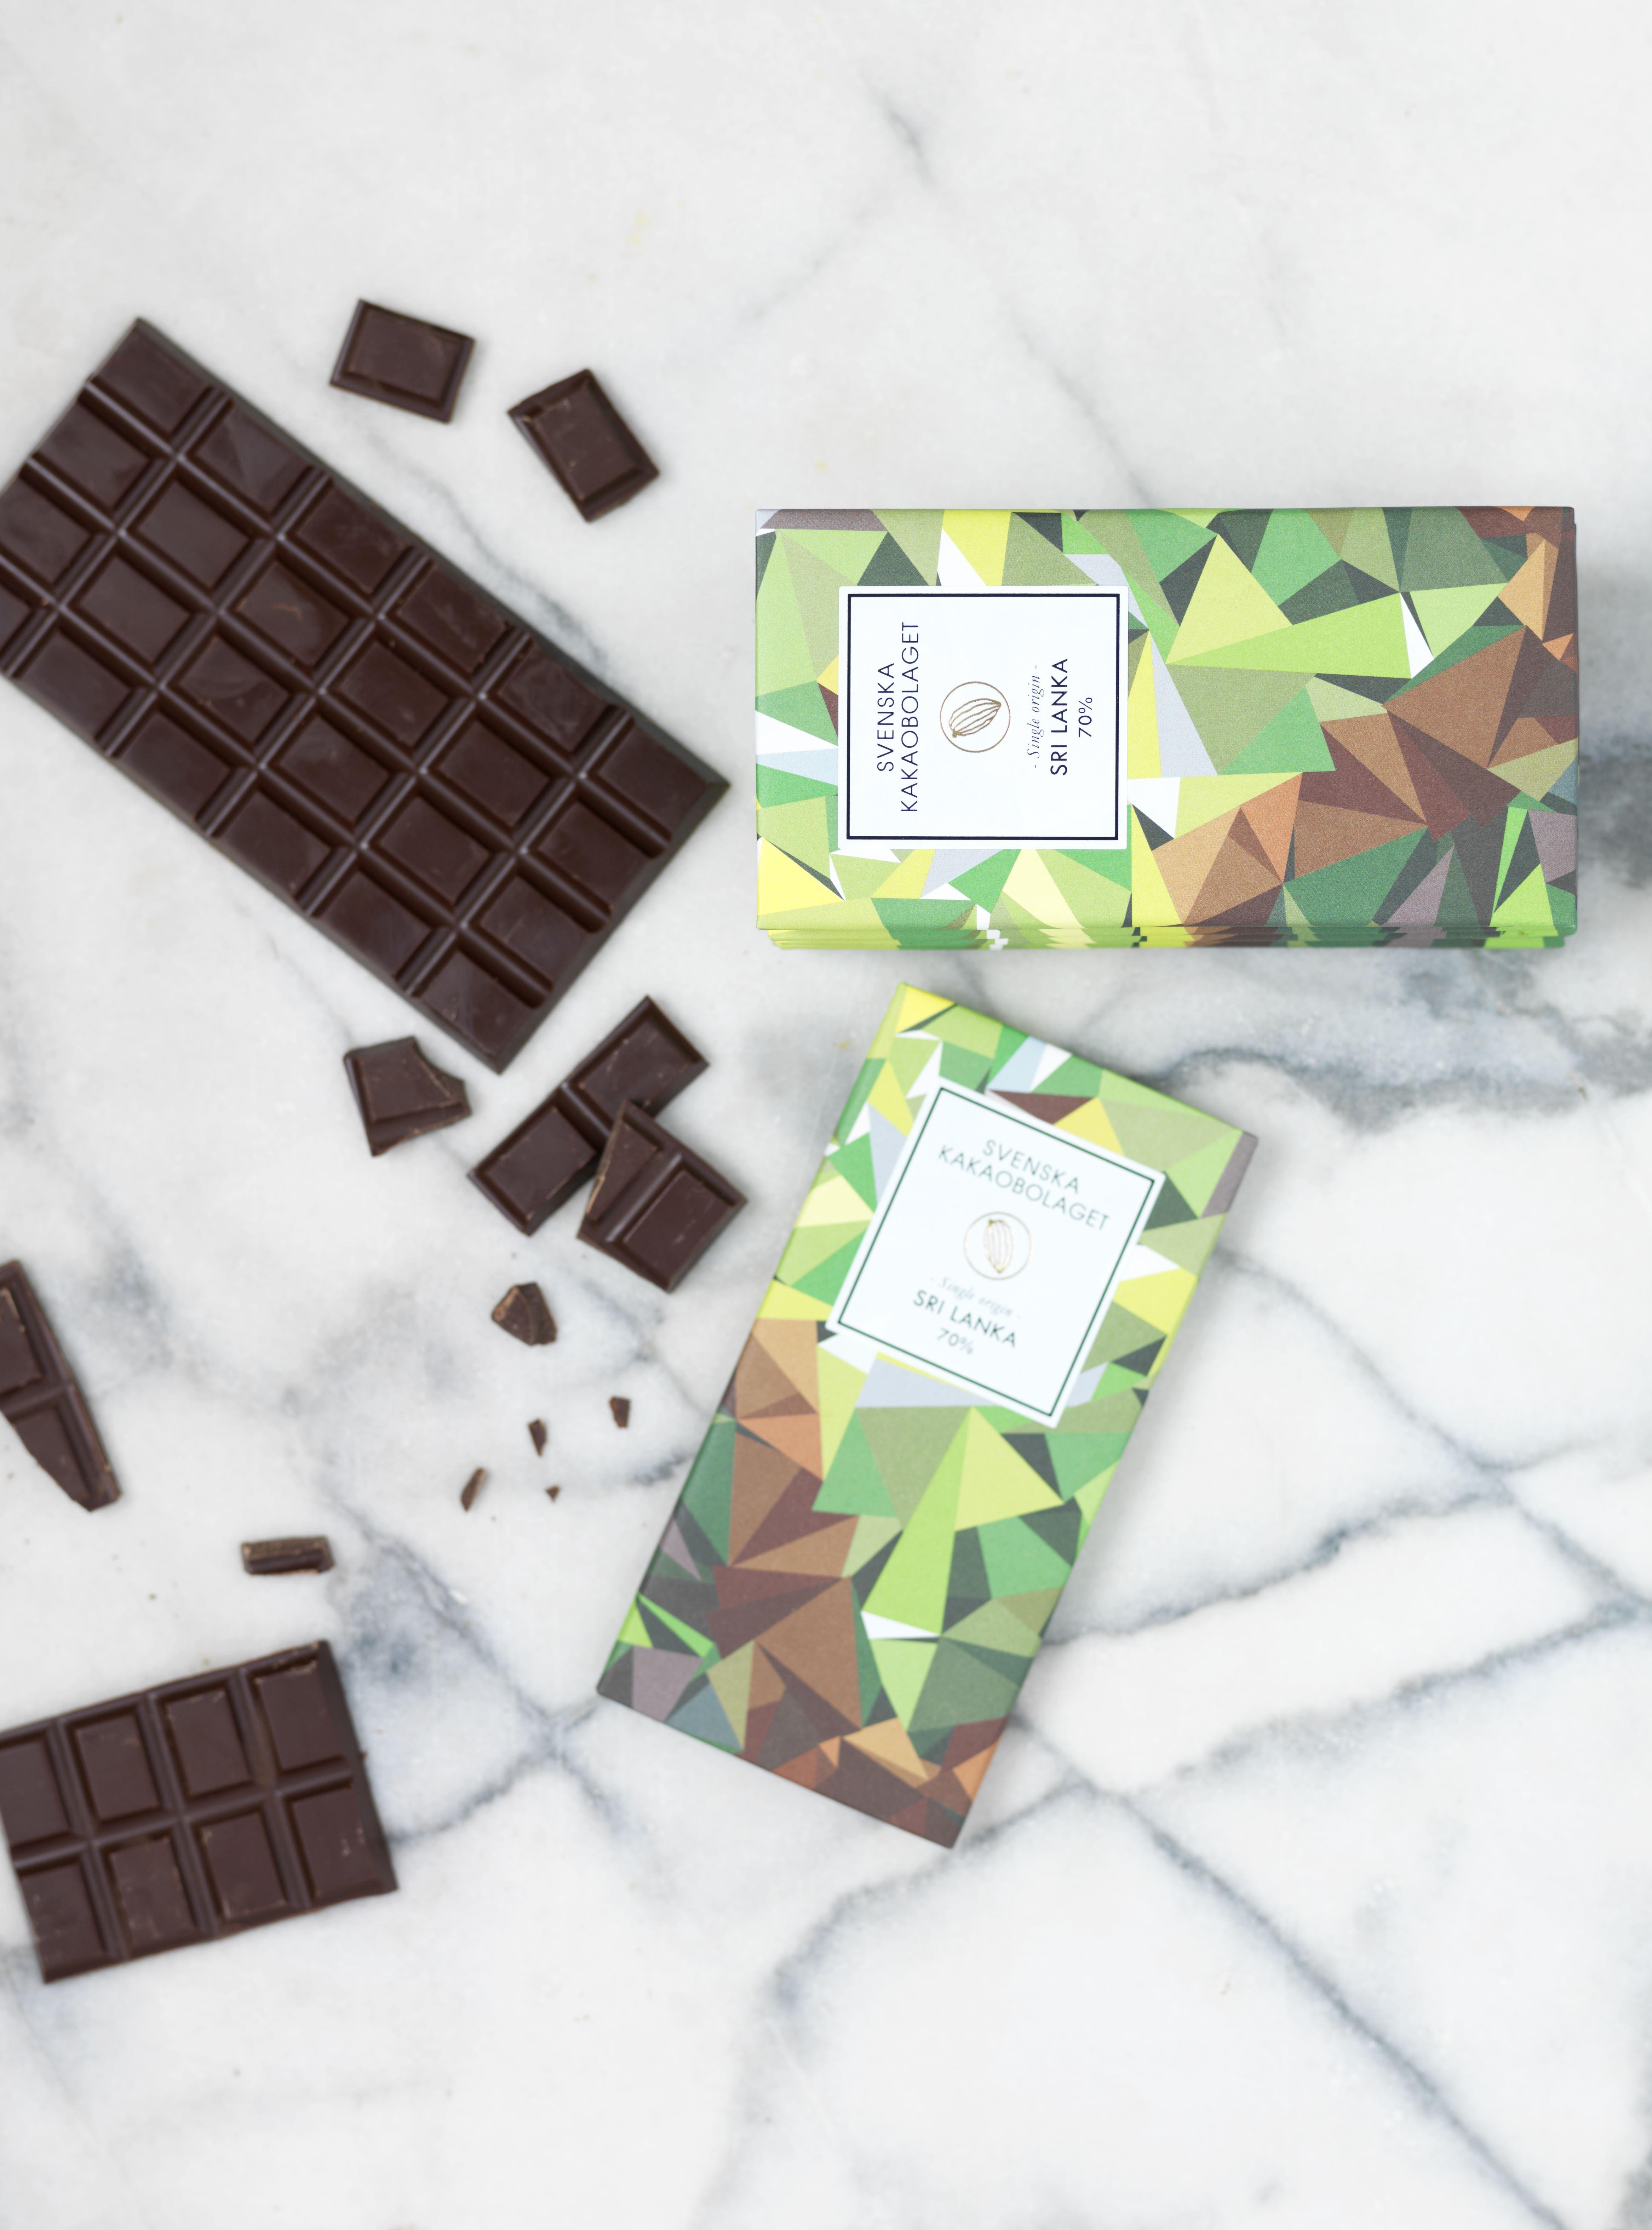 Chokladprovning - Bean to bar